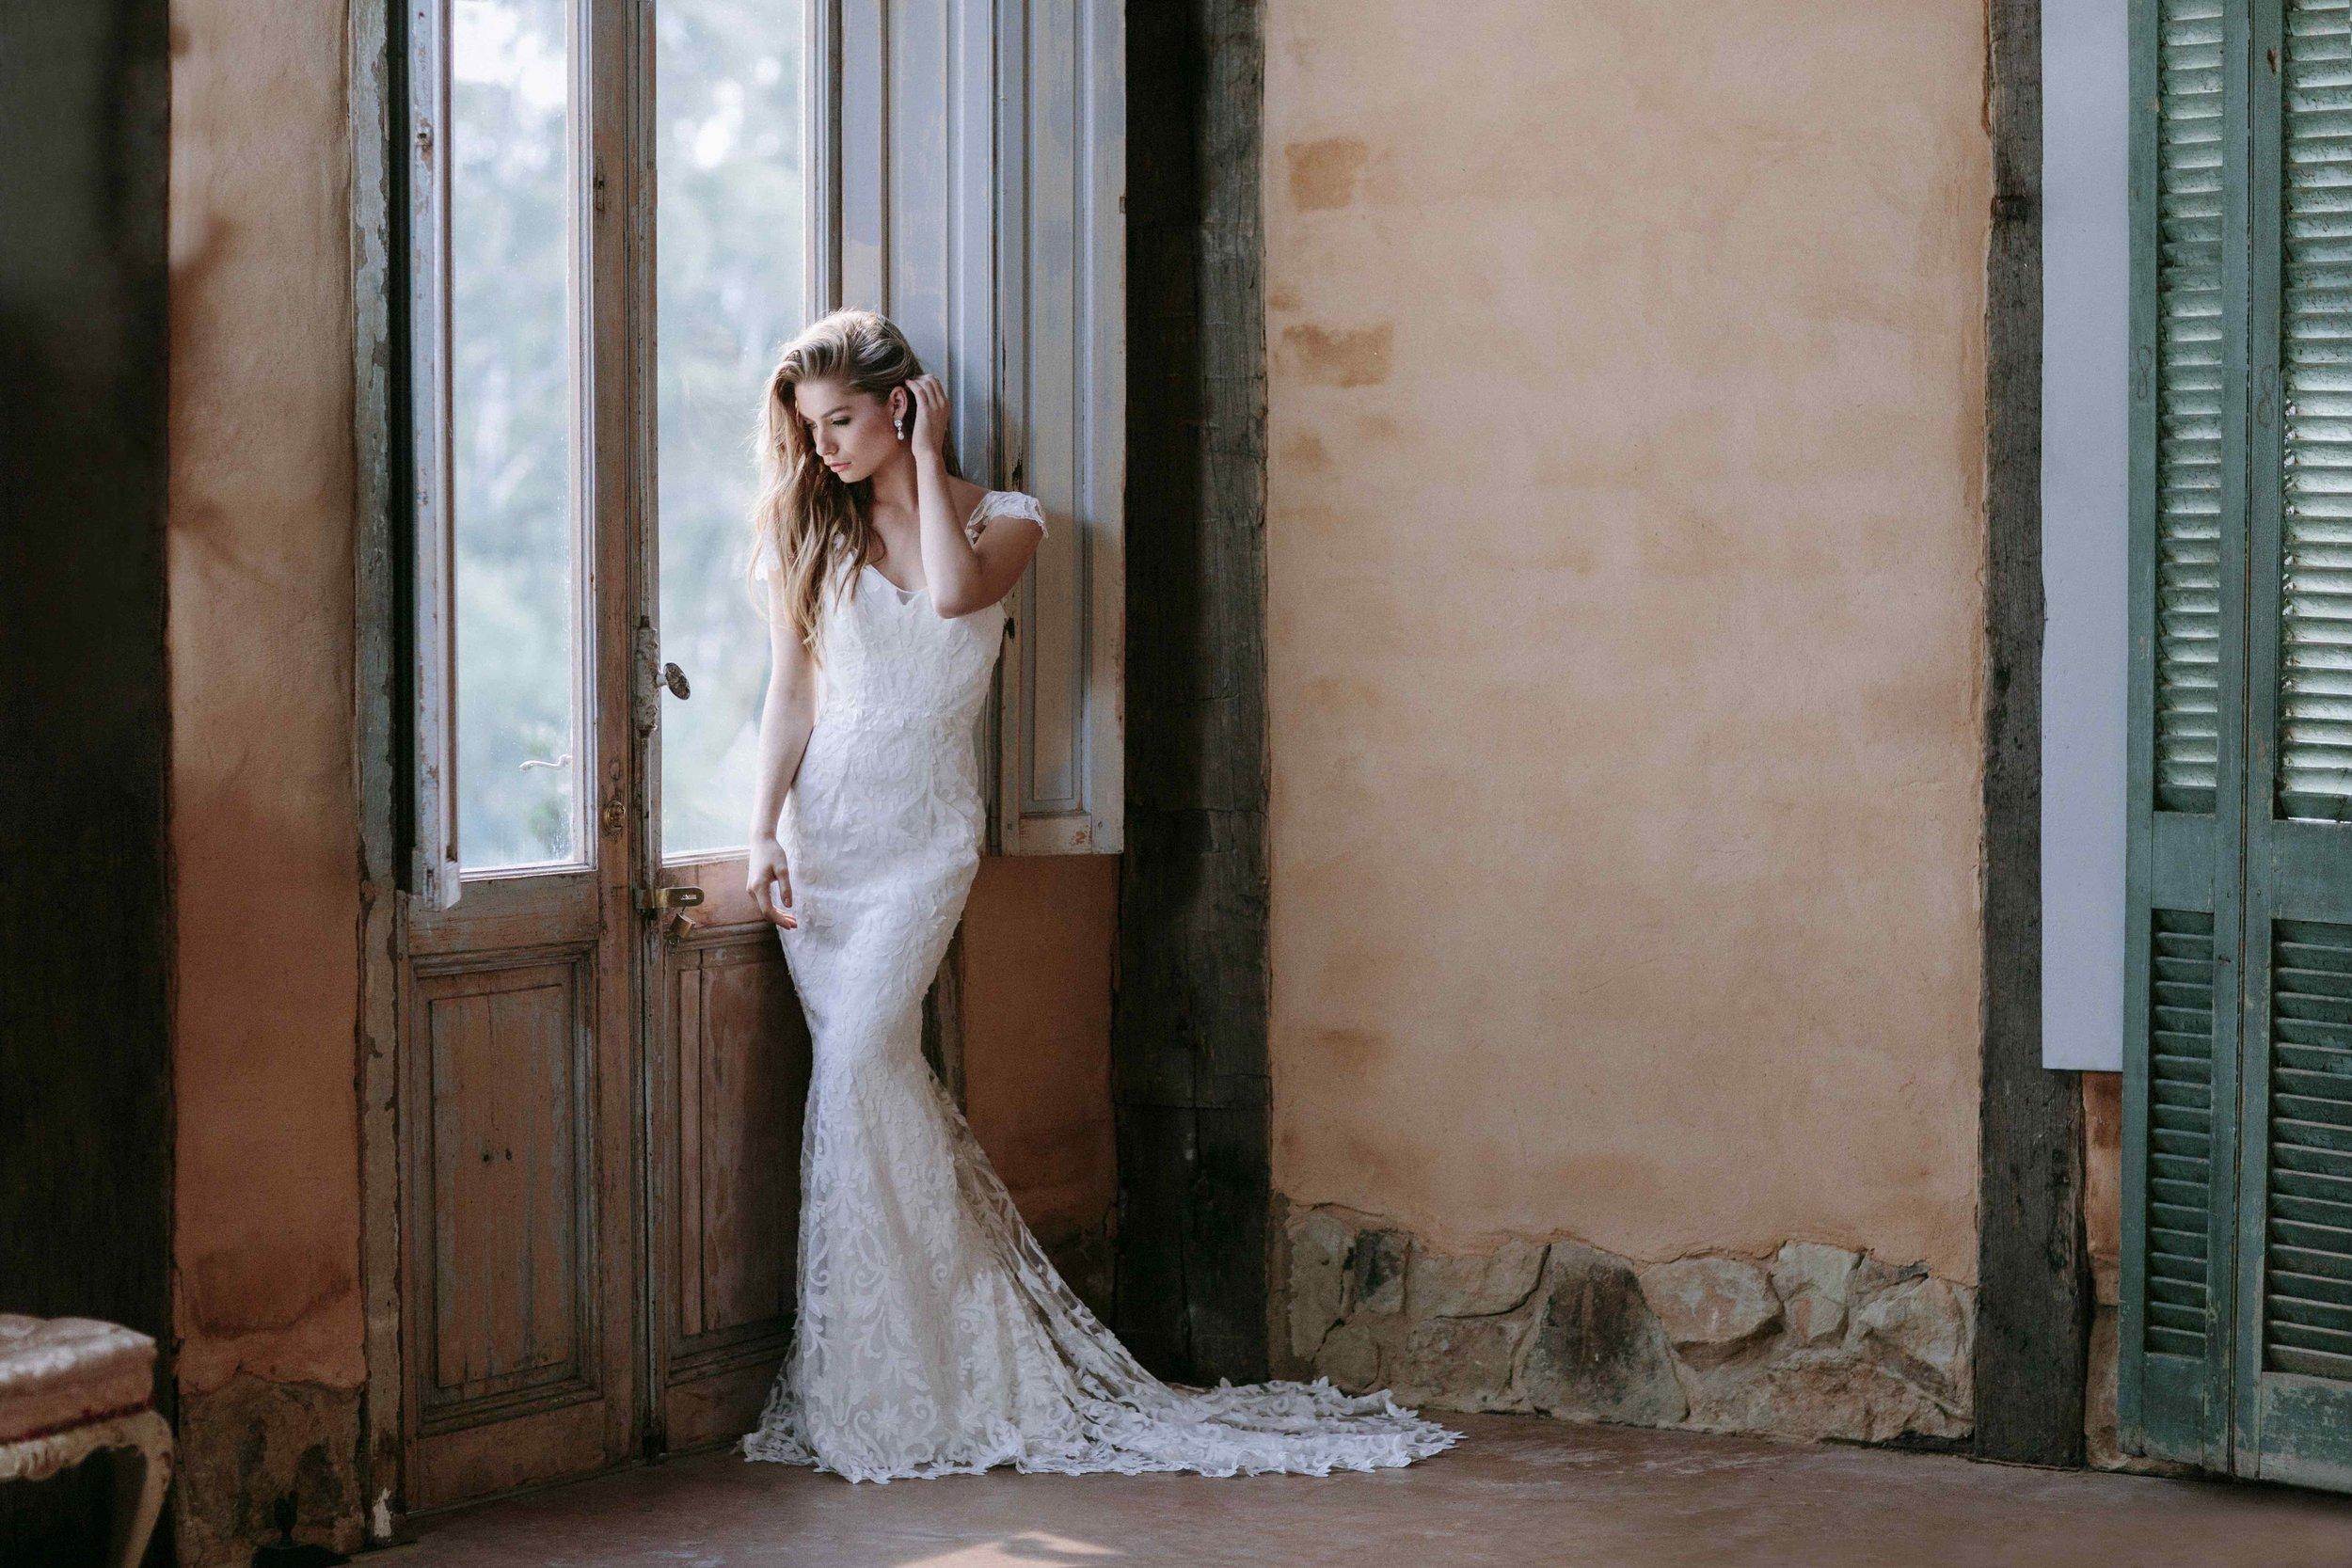 Ceremony_Collection_Windsor_Dress_Image_5 copy.jpg